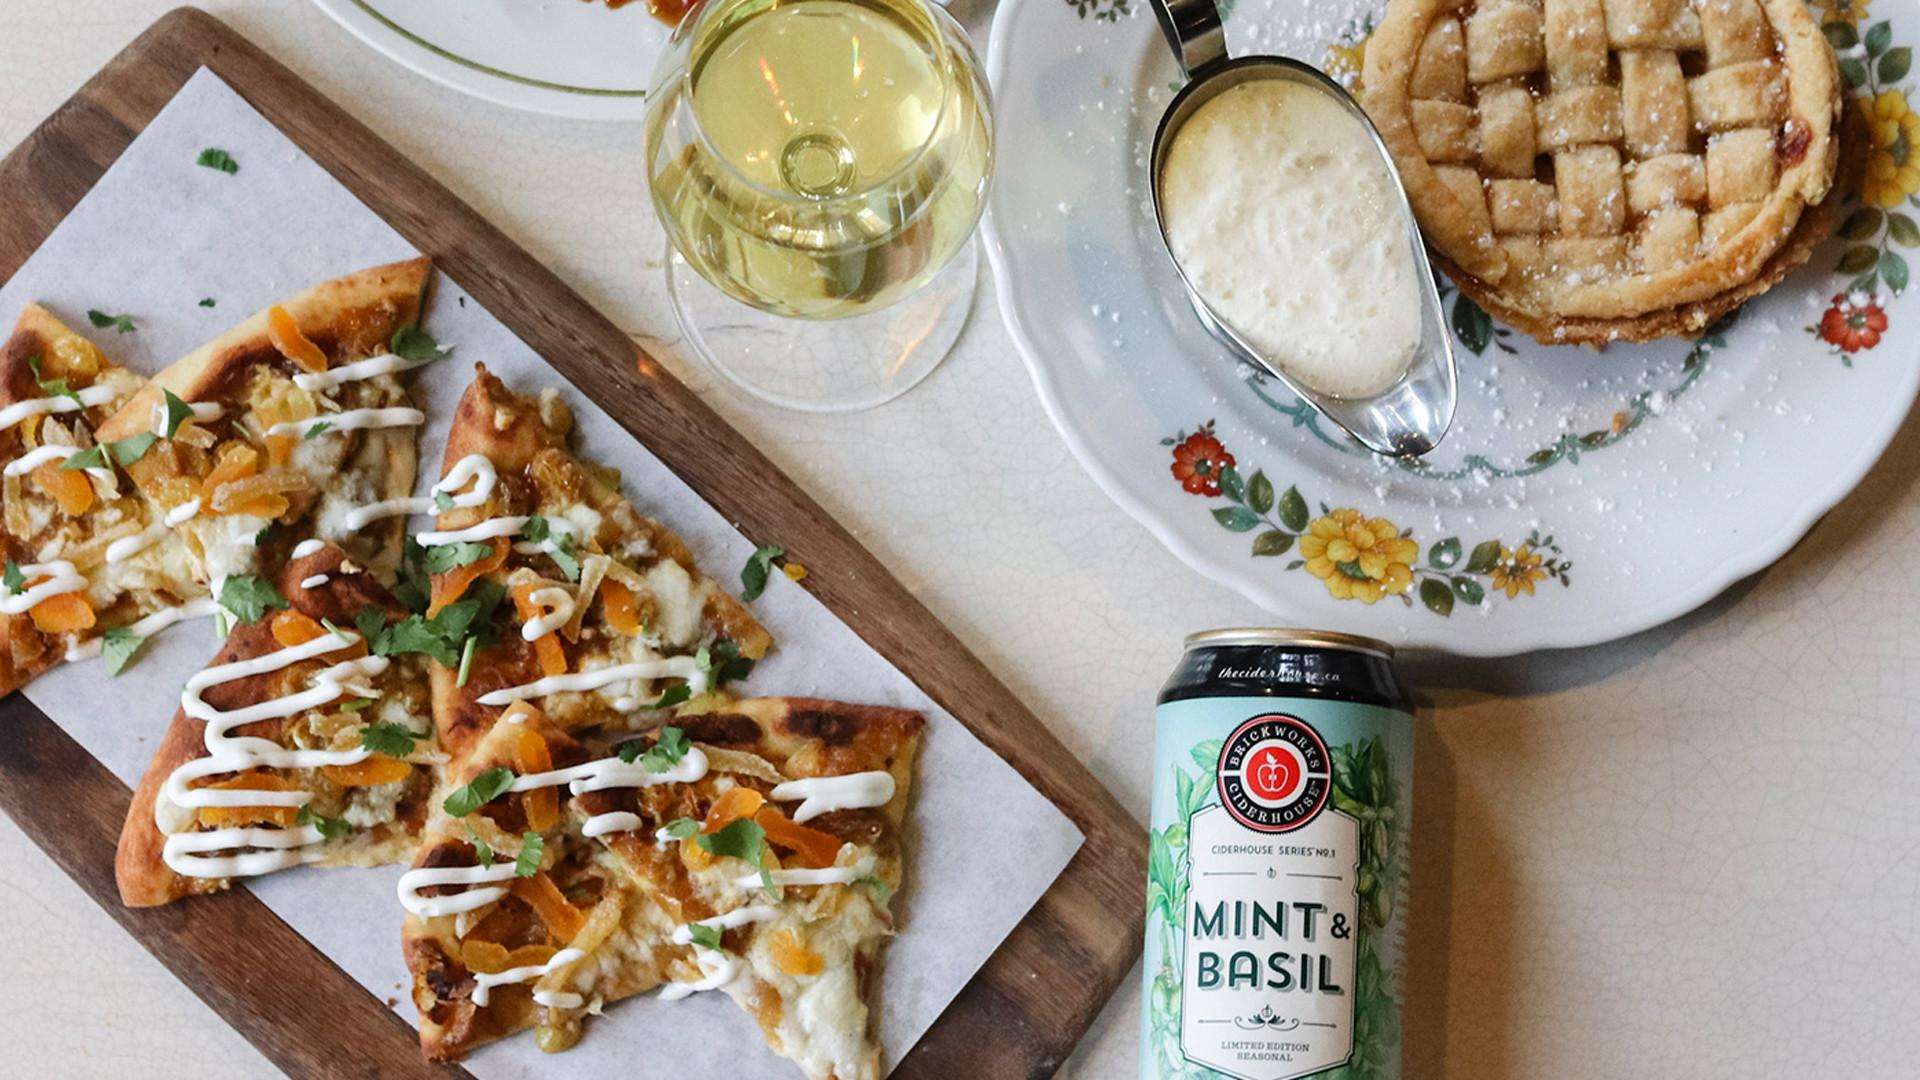 Brickworks Ciderhouse Toronto craft cider | Seasonal Mint and Basil cider paired with food